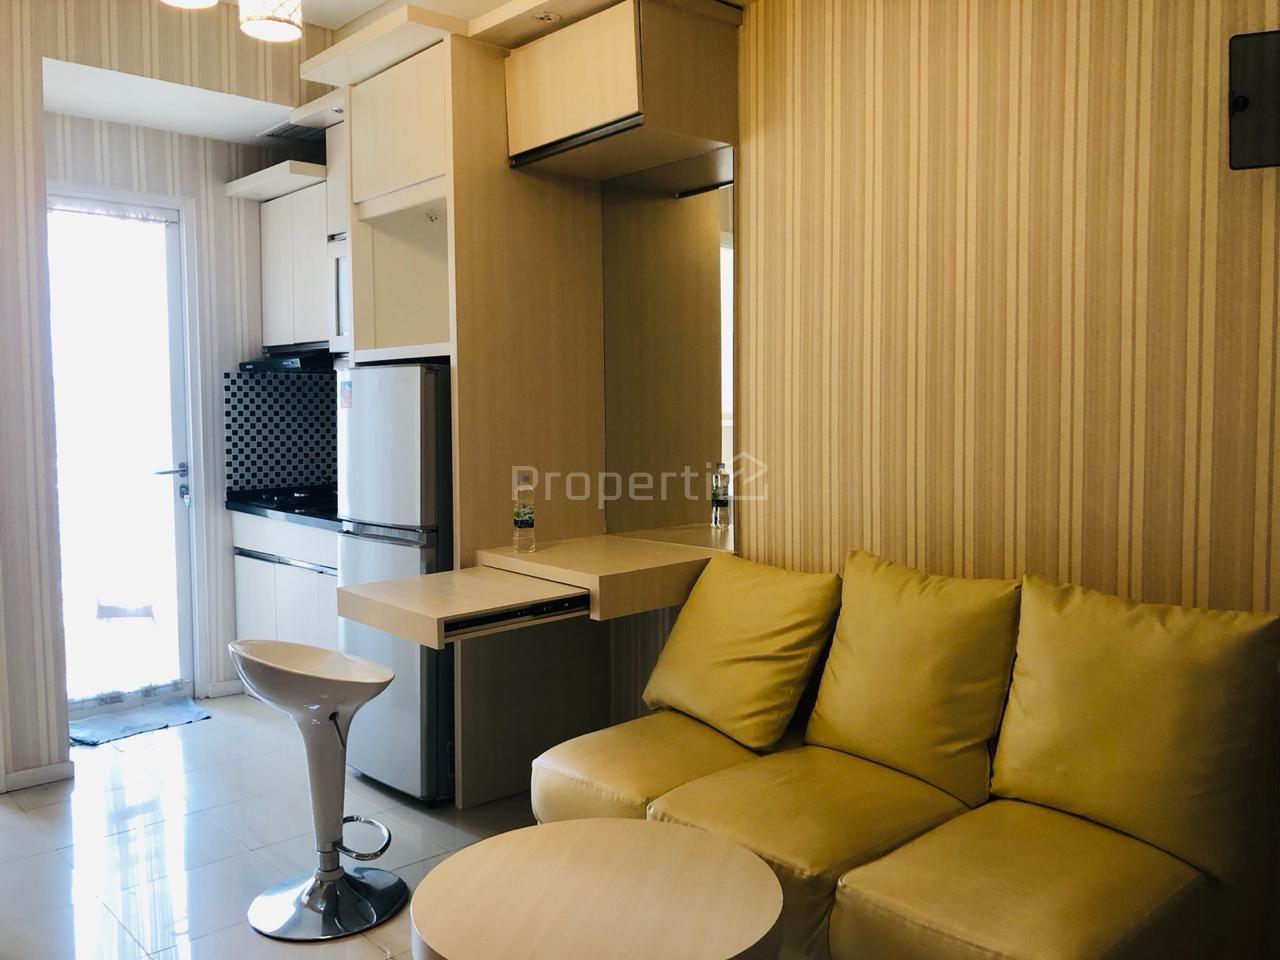 1BR Apartment Unit at Parahyangan Residences, 17th Floor, Jawa Barat